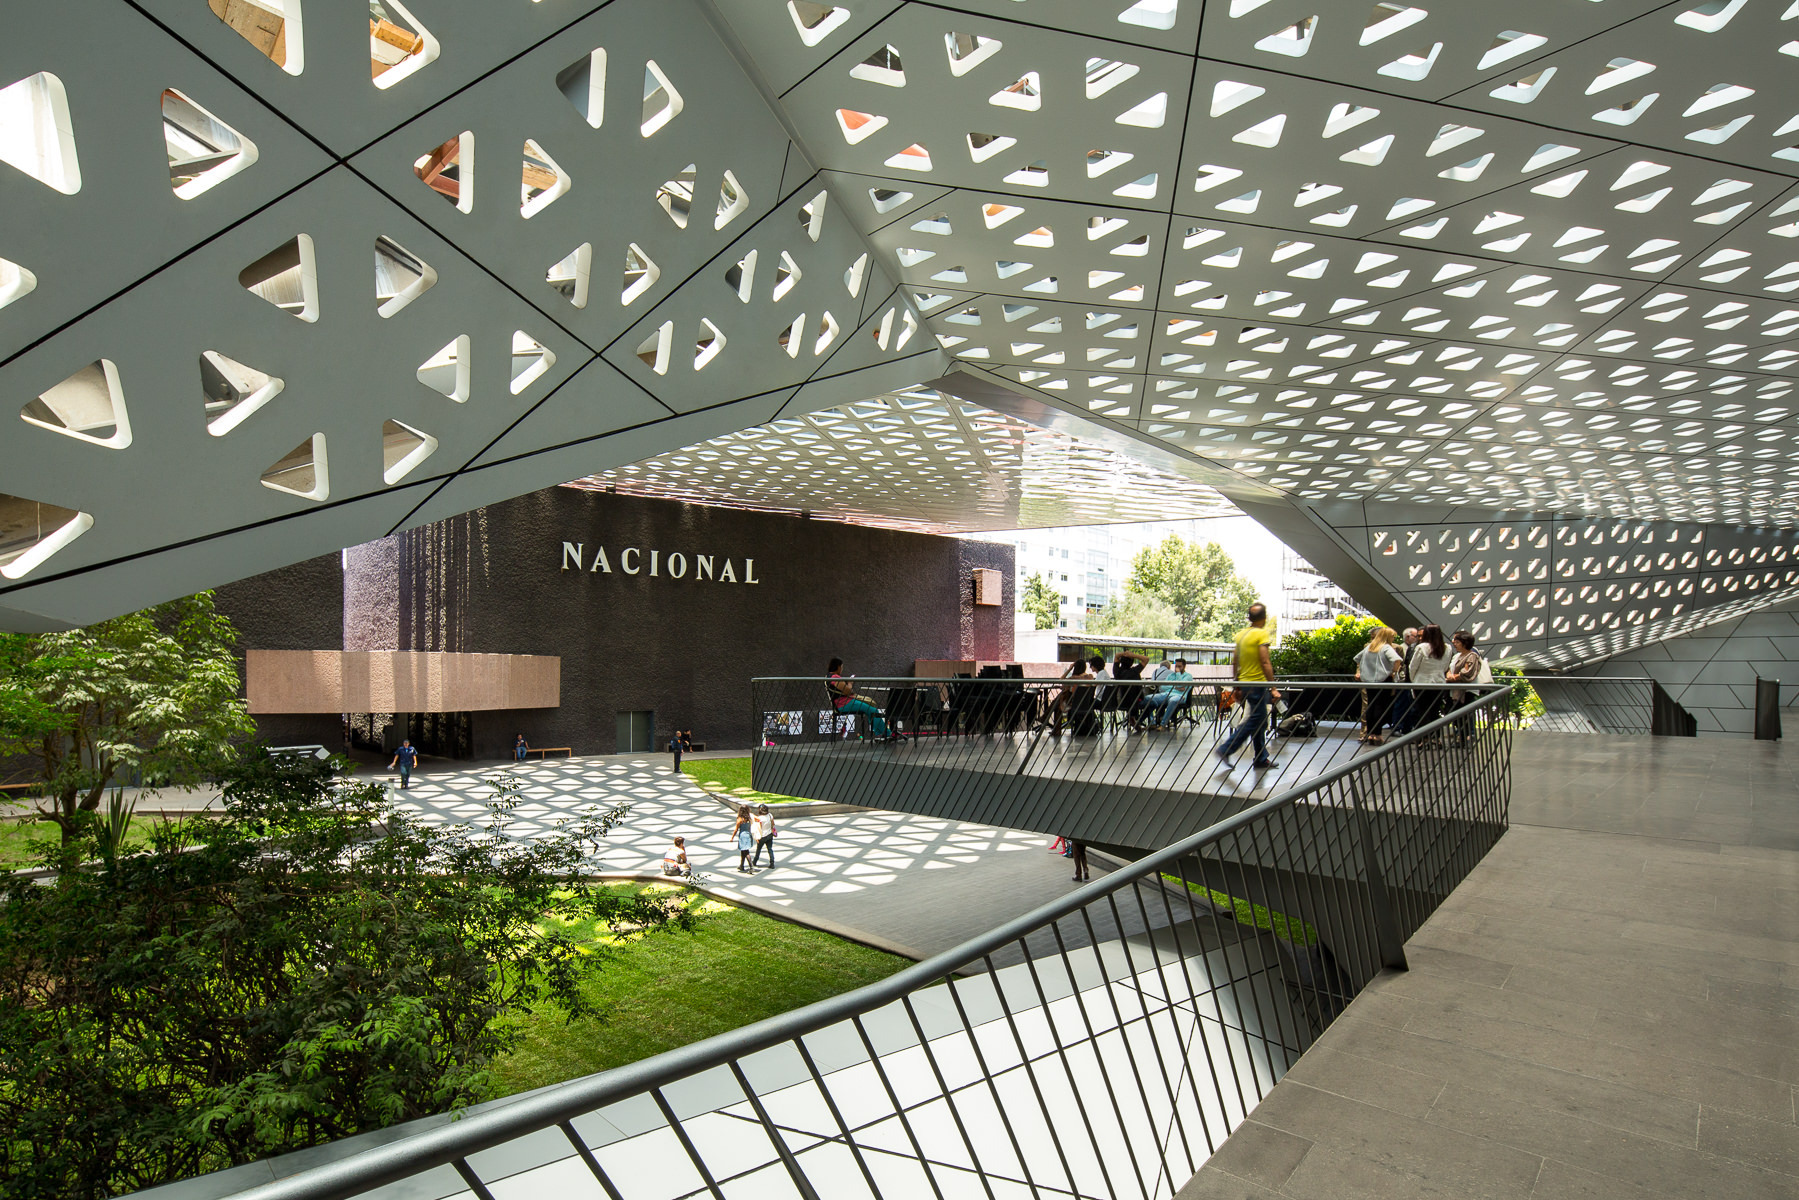 Rojkind_Cineteca Nacional Mexico